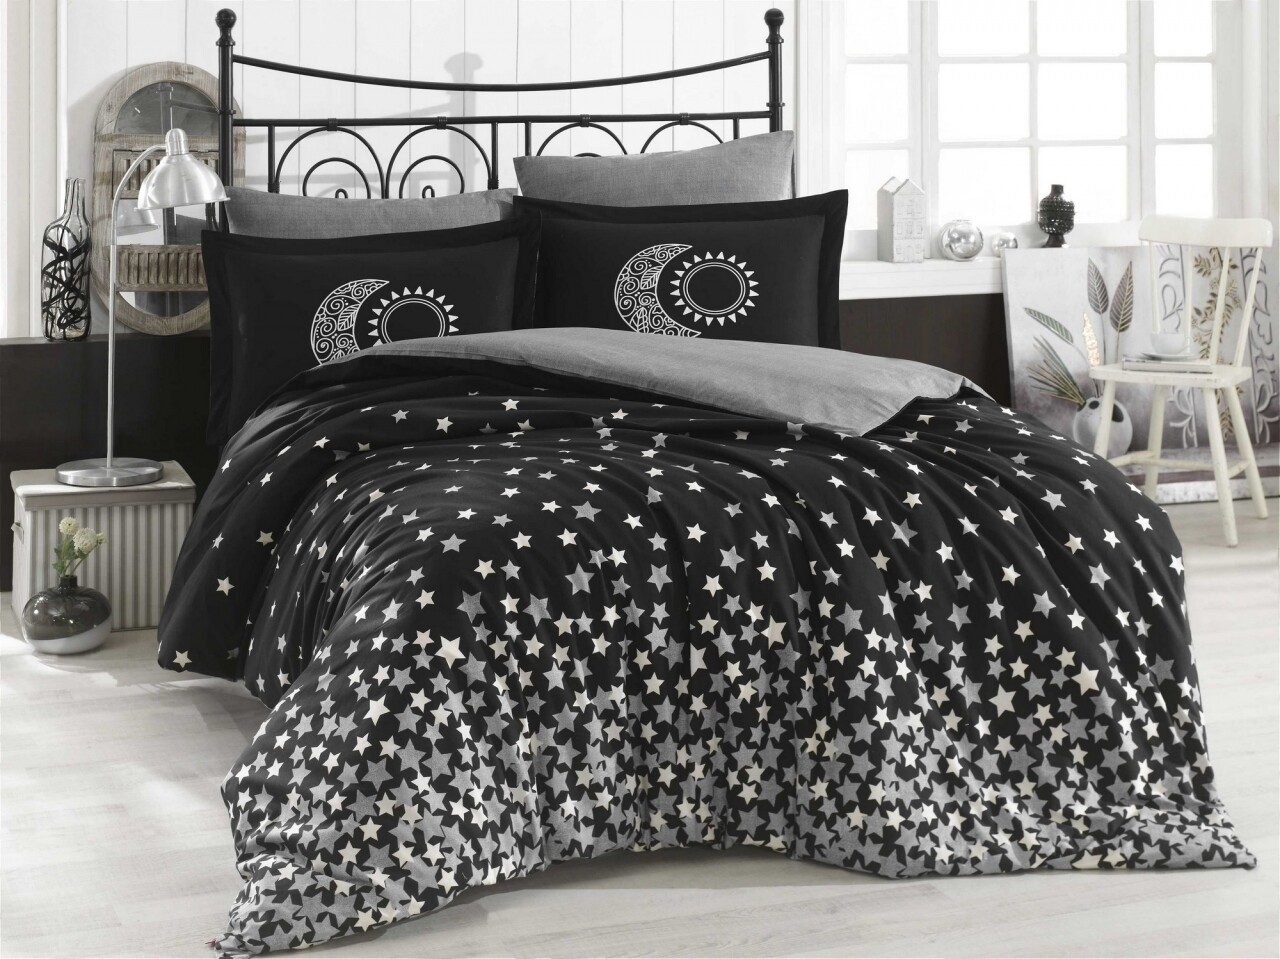 Lenjerie de pat pentru o persoana, 3 piese, 100% bumbac poplin, Hobby, Star's, alb/negru